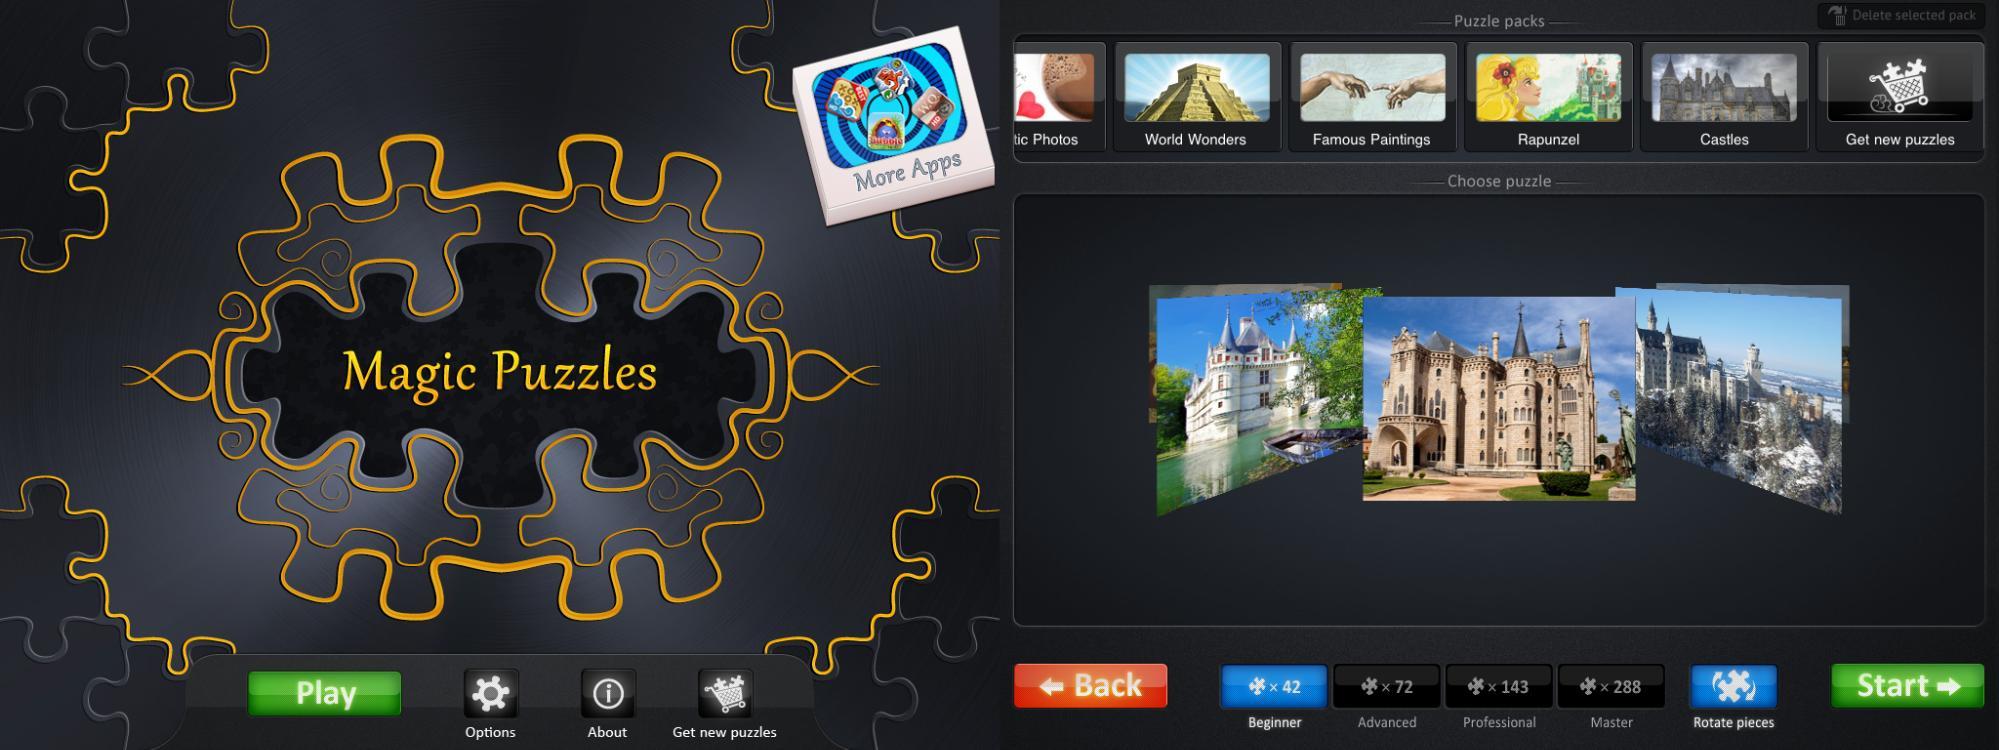 RU_metallic_magic_jigsaw_puzzles